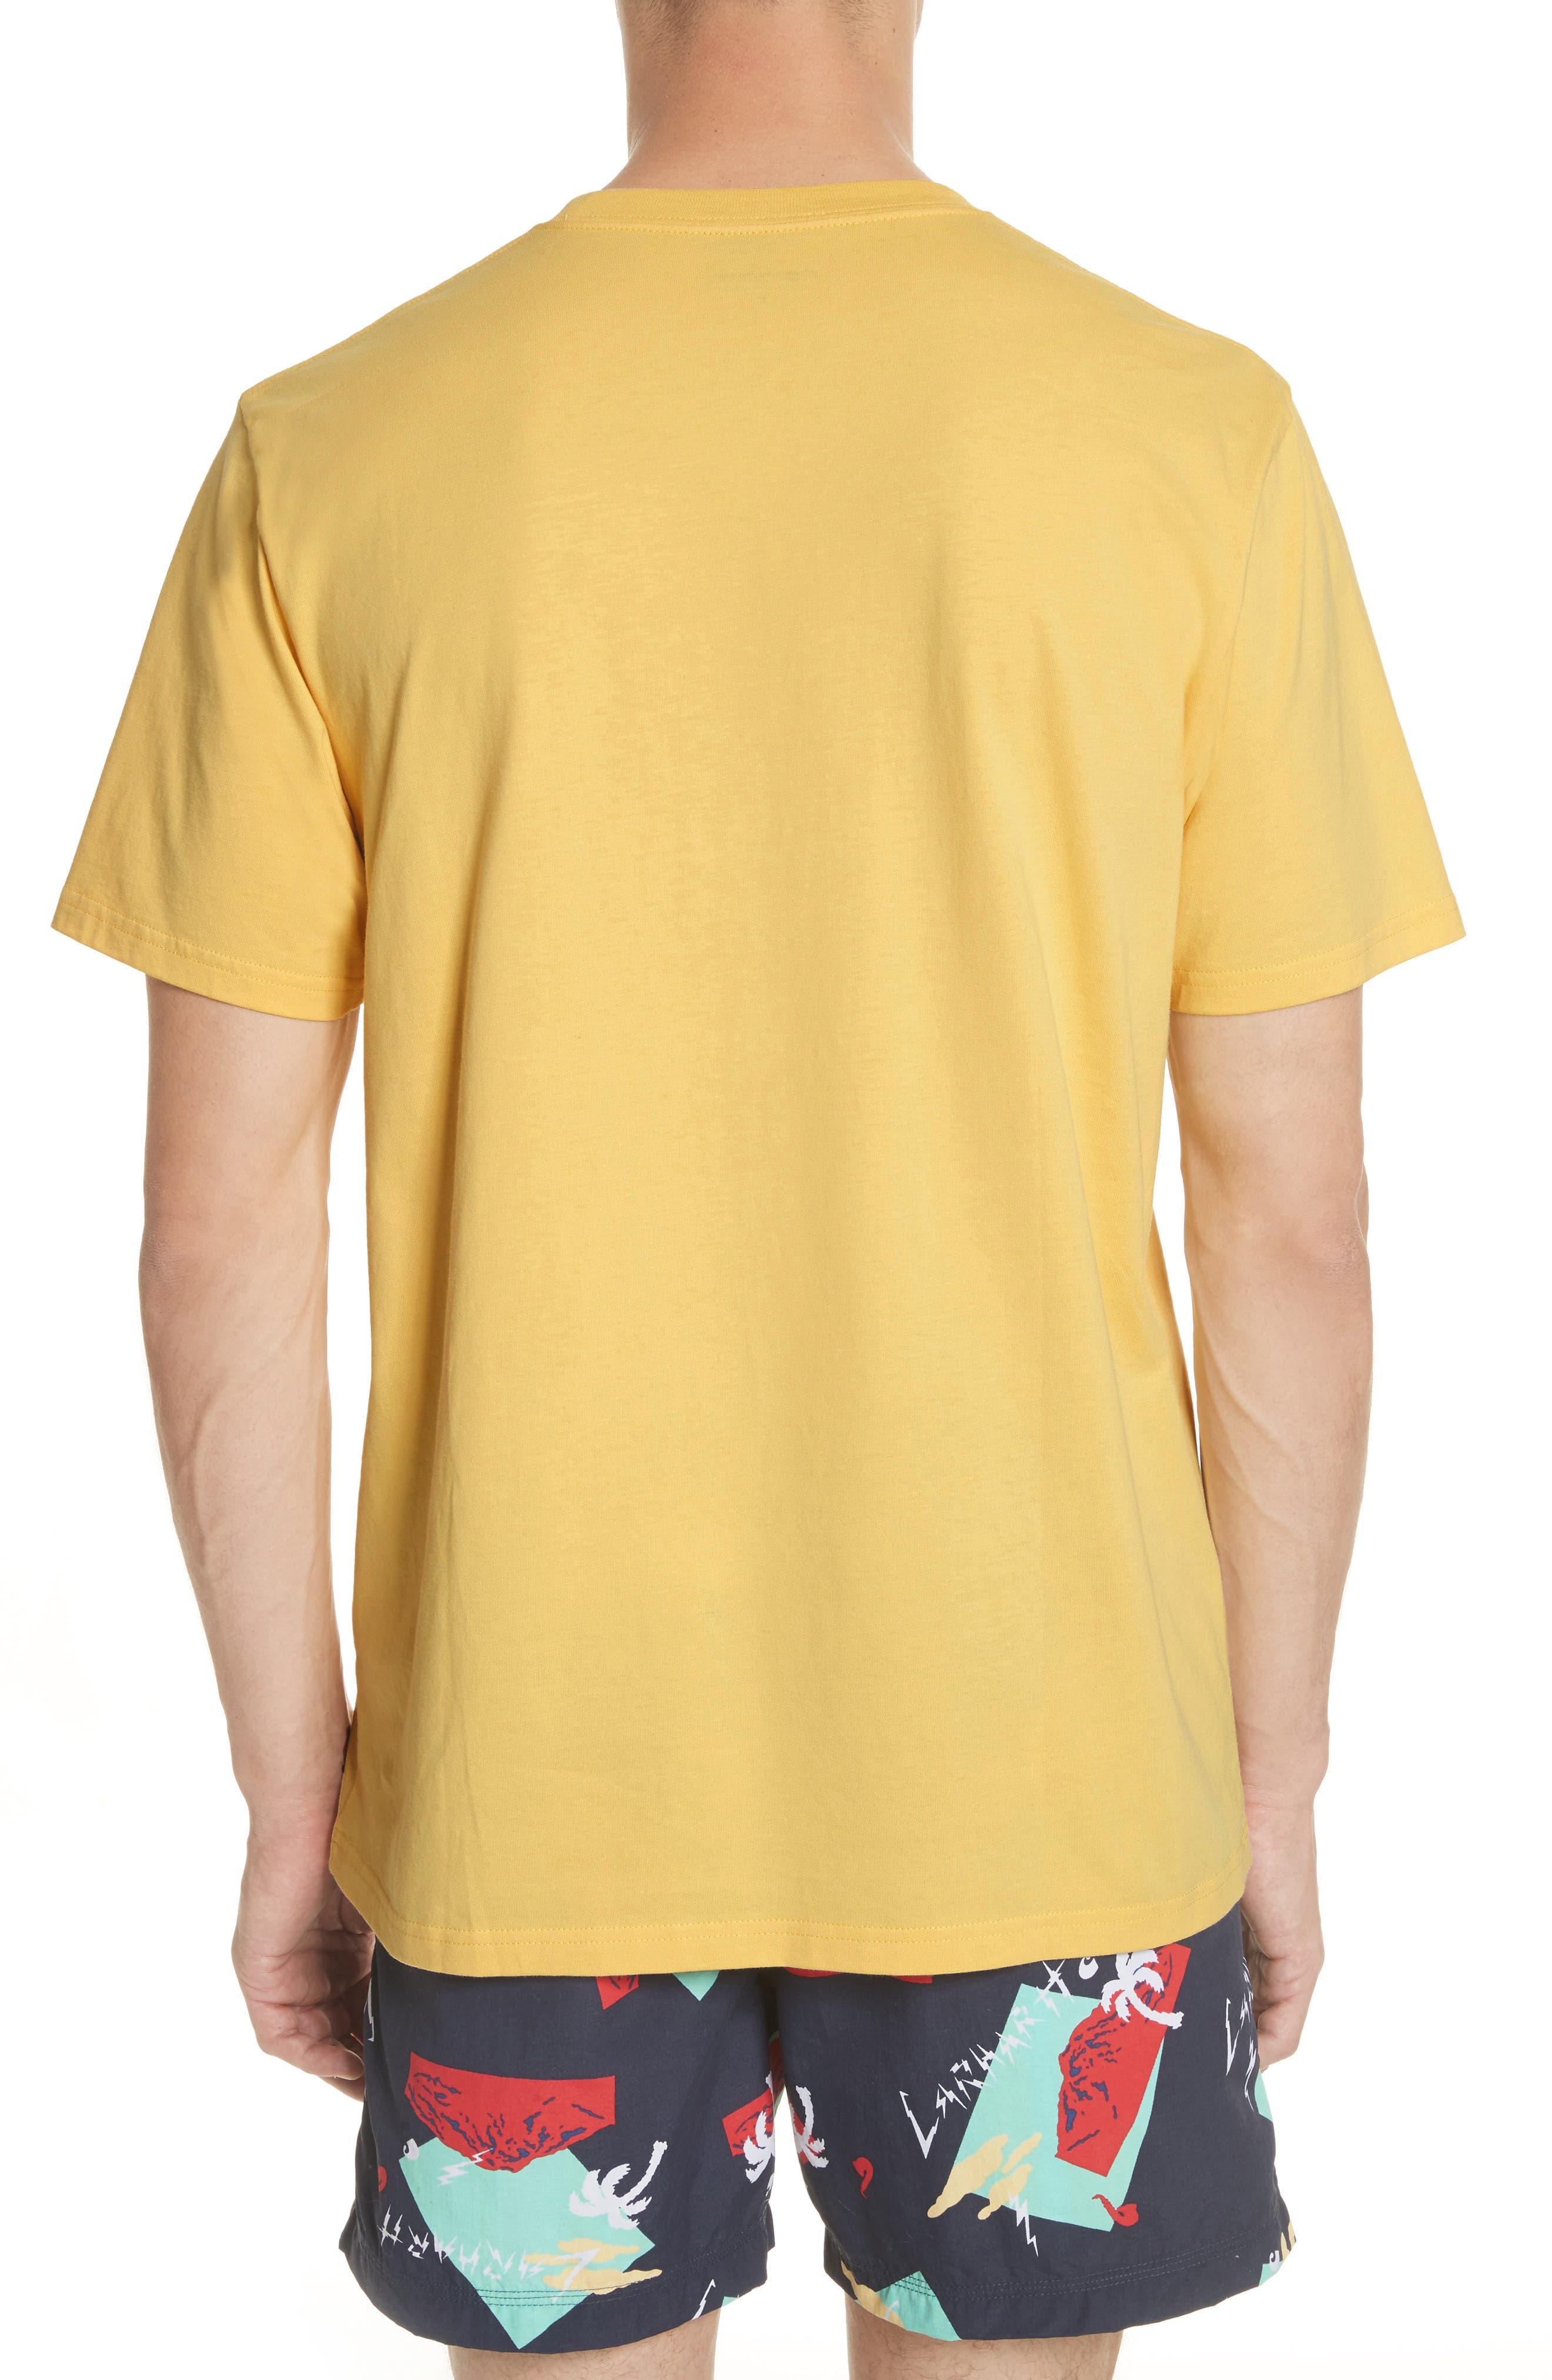 Anderson T-Shirt,                             Alternate thumbnail 2, color,                             Citrine